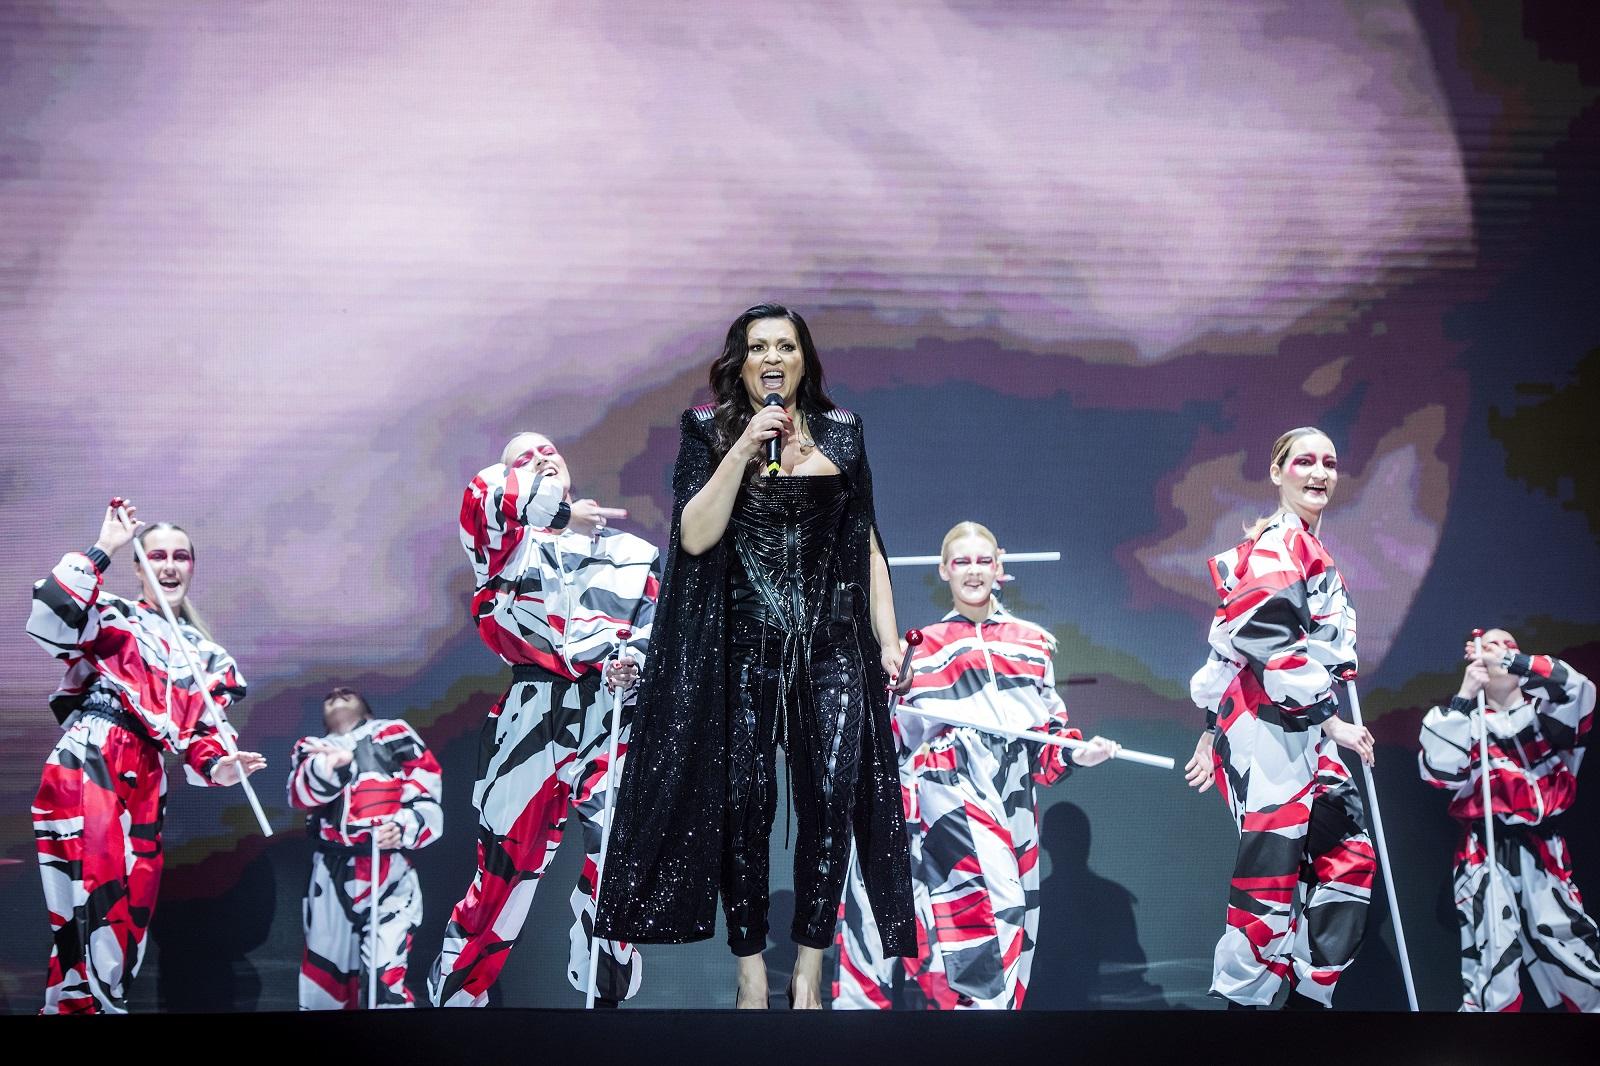 Zagreb, 070320. Koncert Nine Badric u Areni Zagreb. Foto: Neja Markicevic / CROPIX